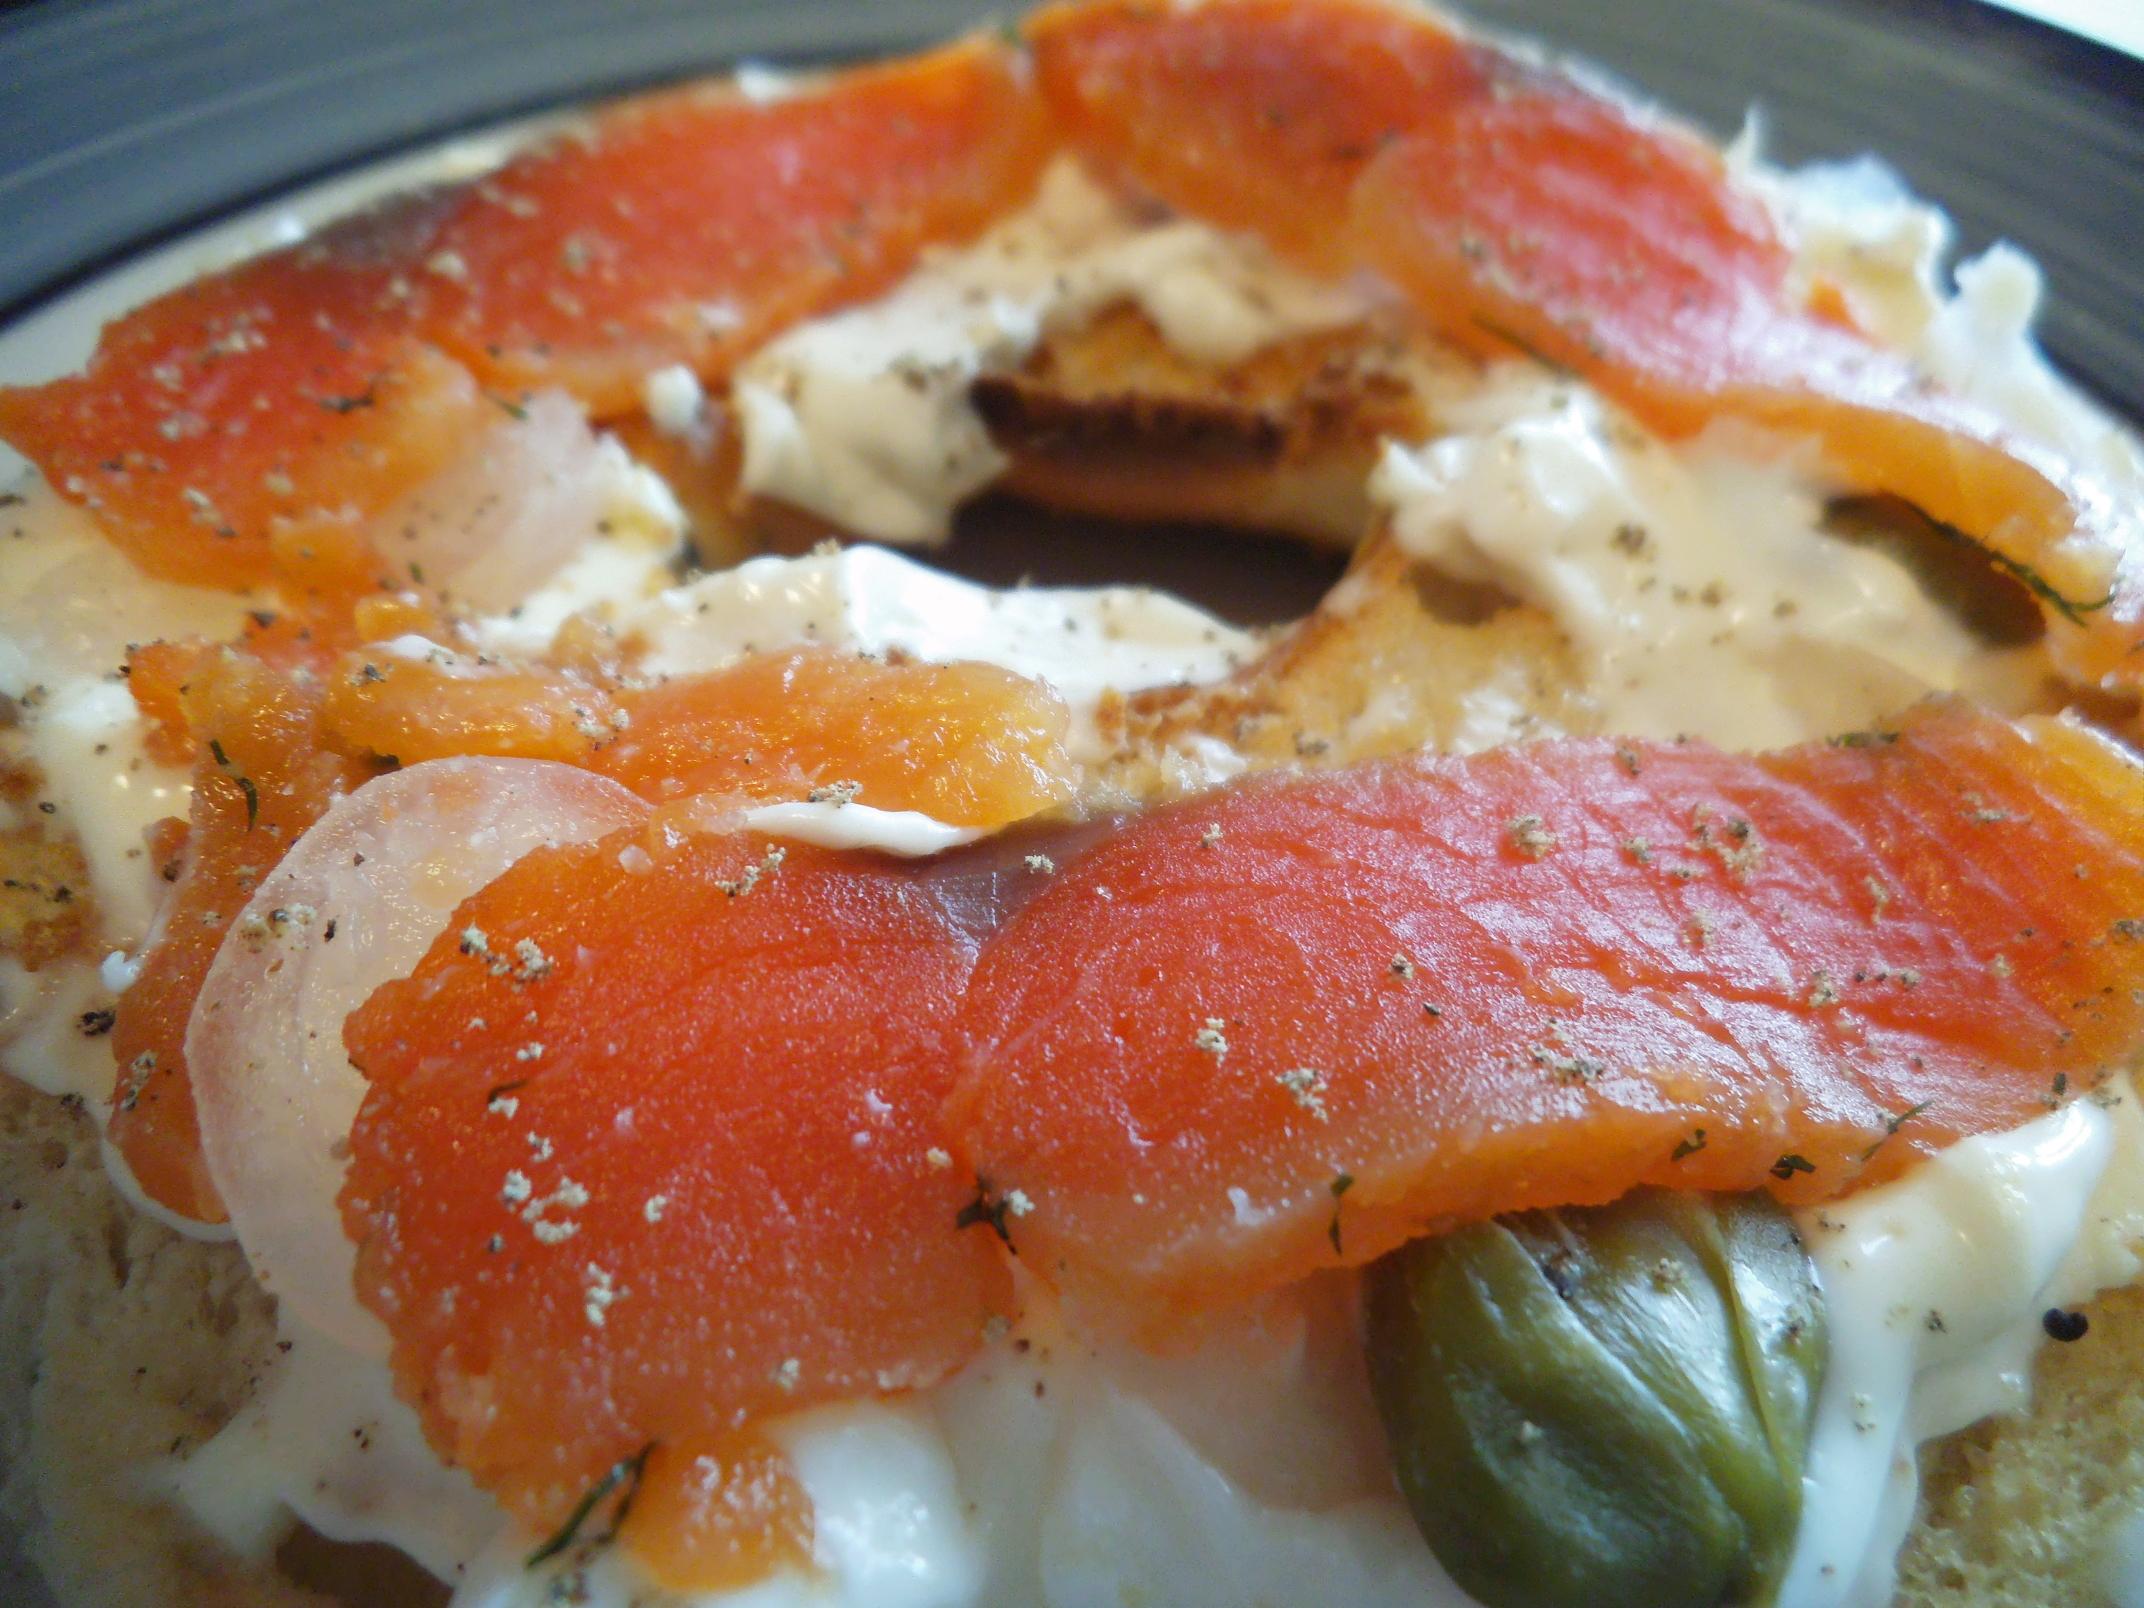 Make your own smoked salmon bigoven for Smoked fish recipe